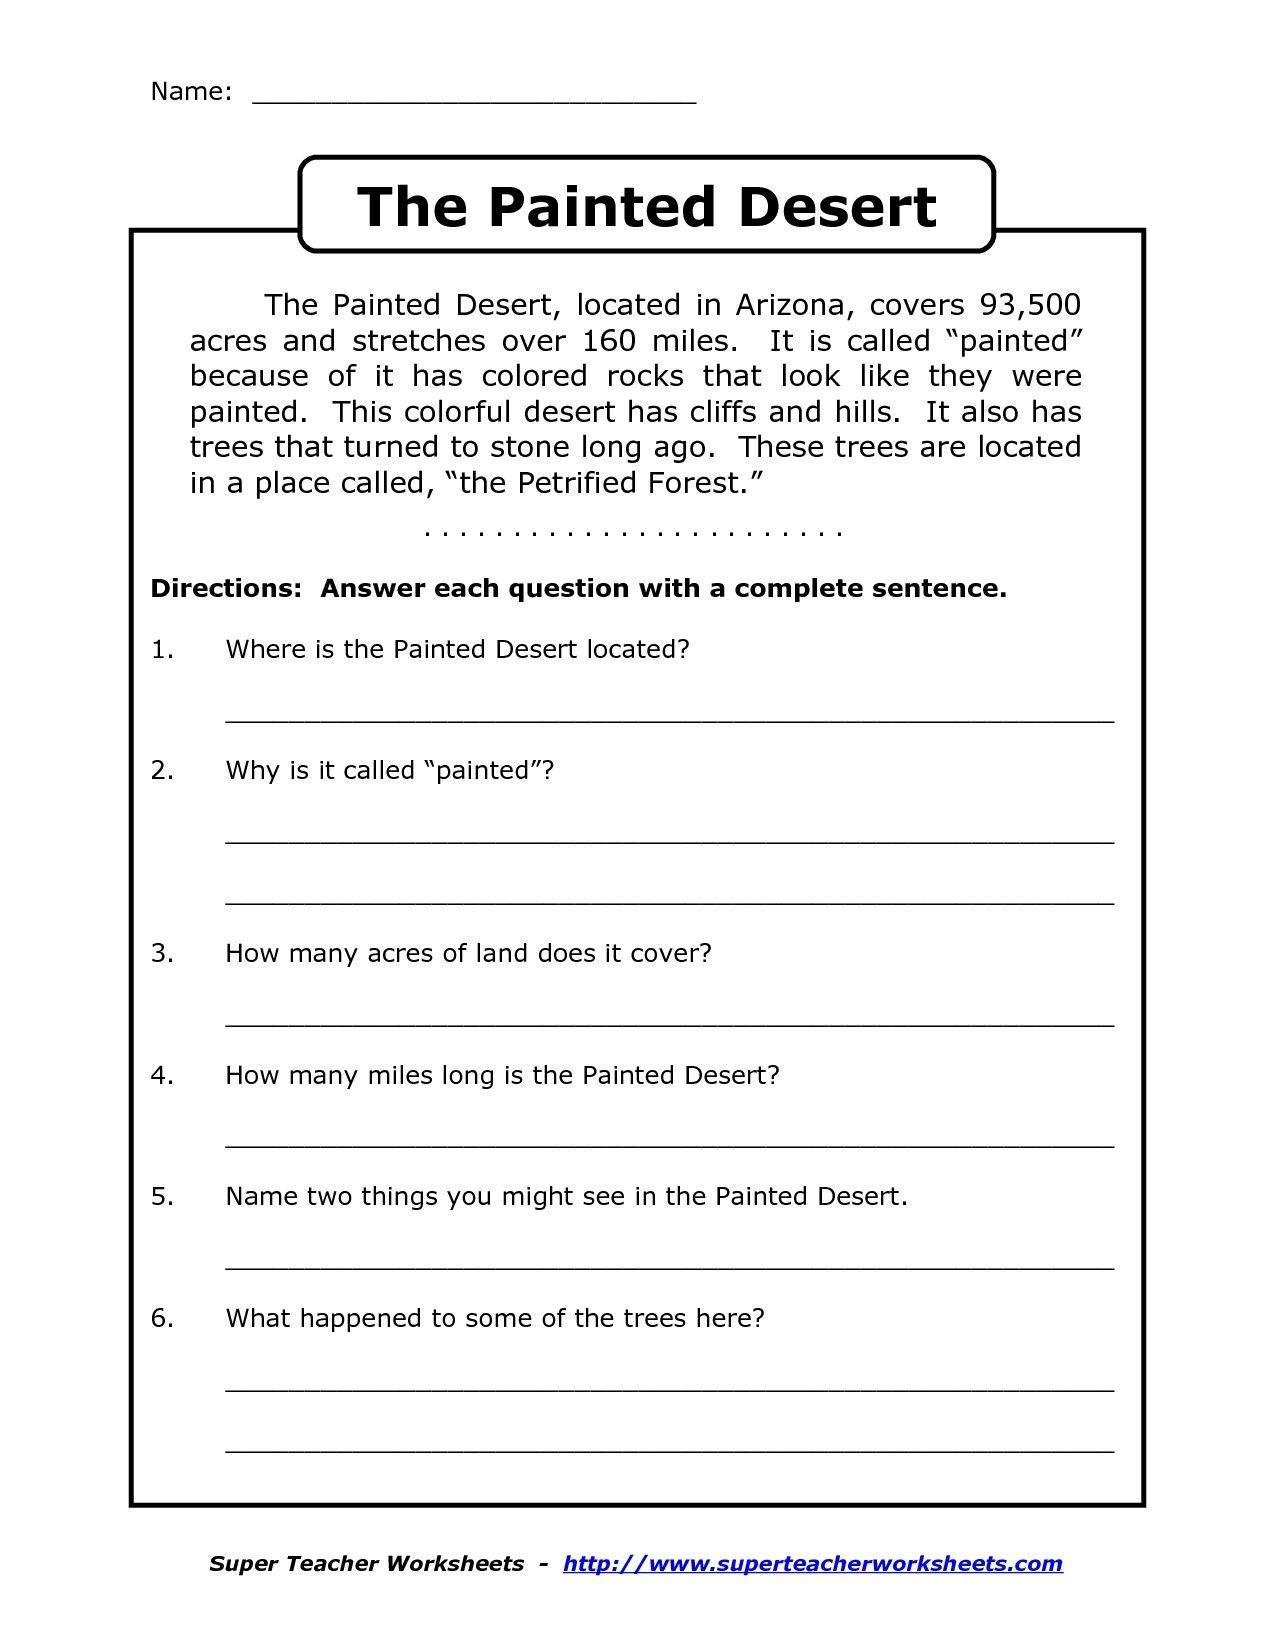 Image Result For Free Printable Worksheets For Grade 4 Comprehension - Free Printable Reading Comprehension Worksheets For Adults